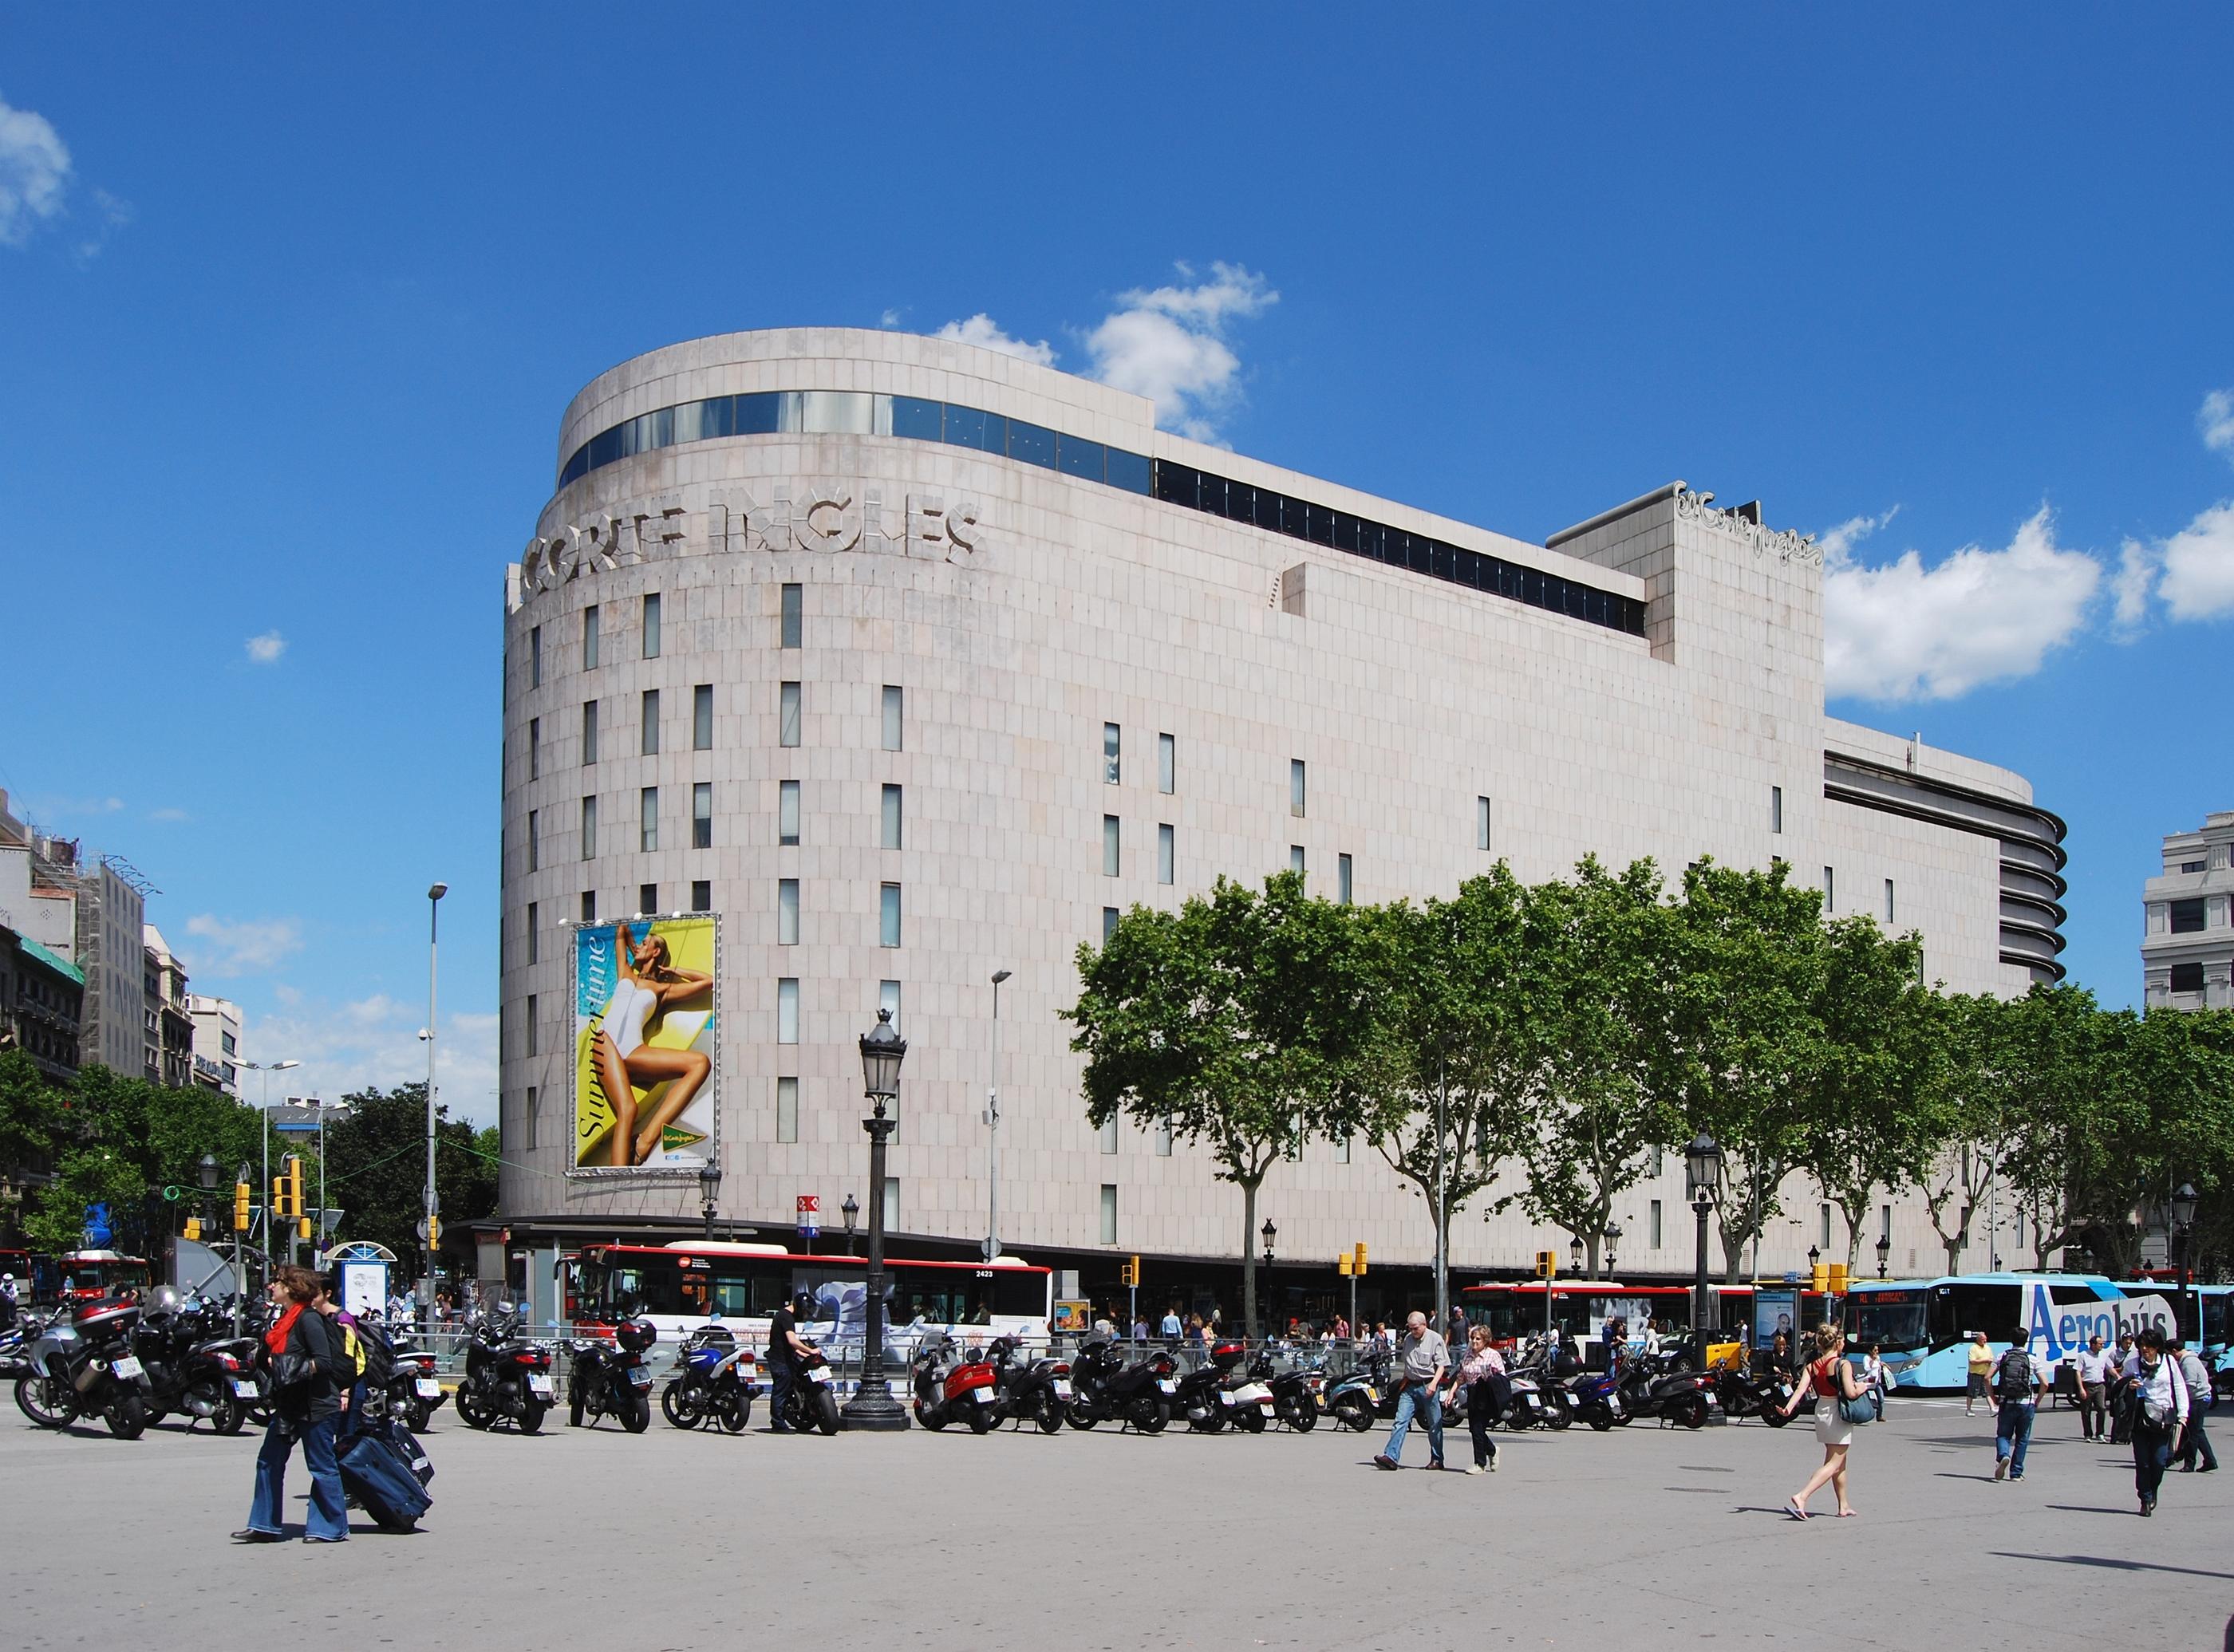 El Corte Inglés Barcelona - Events and Guide Barcelona